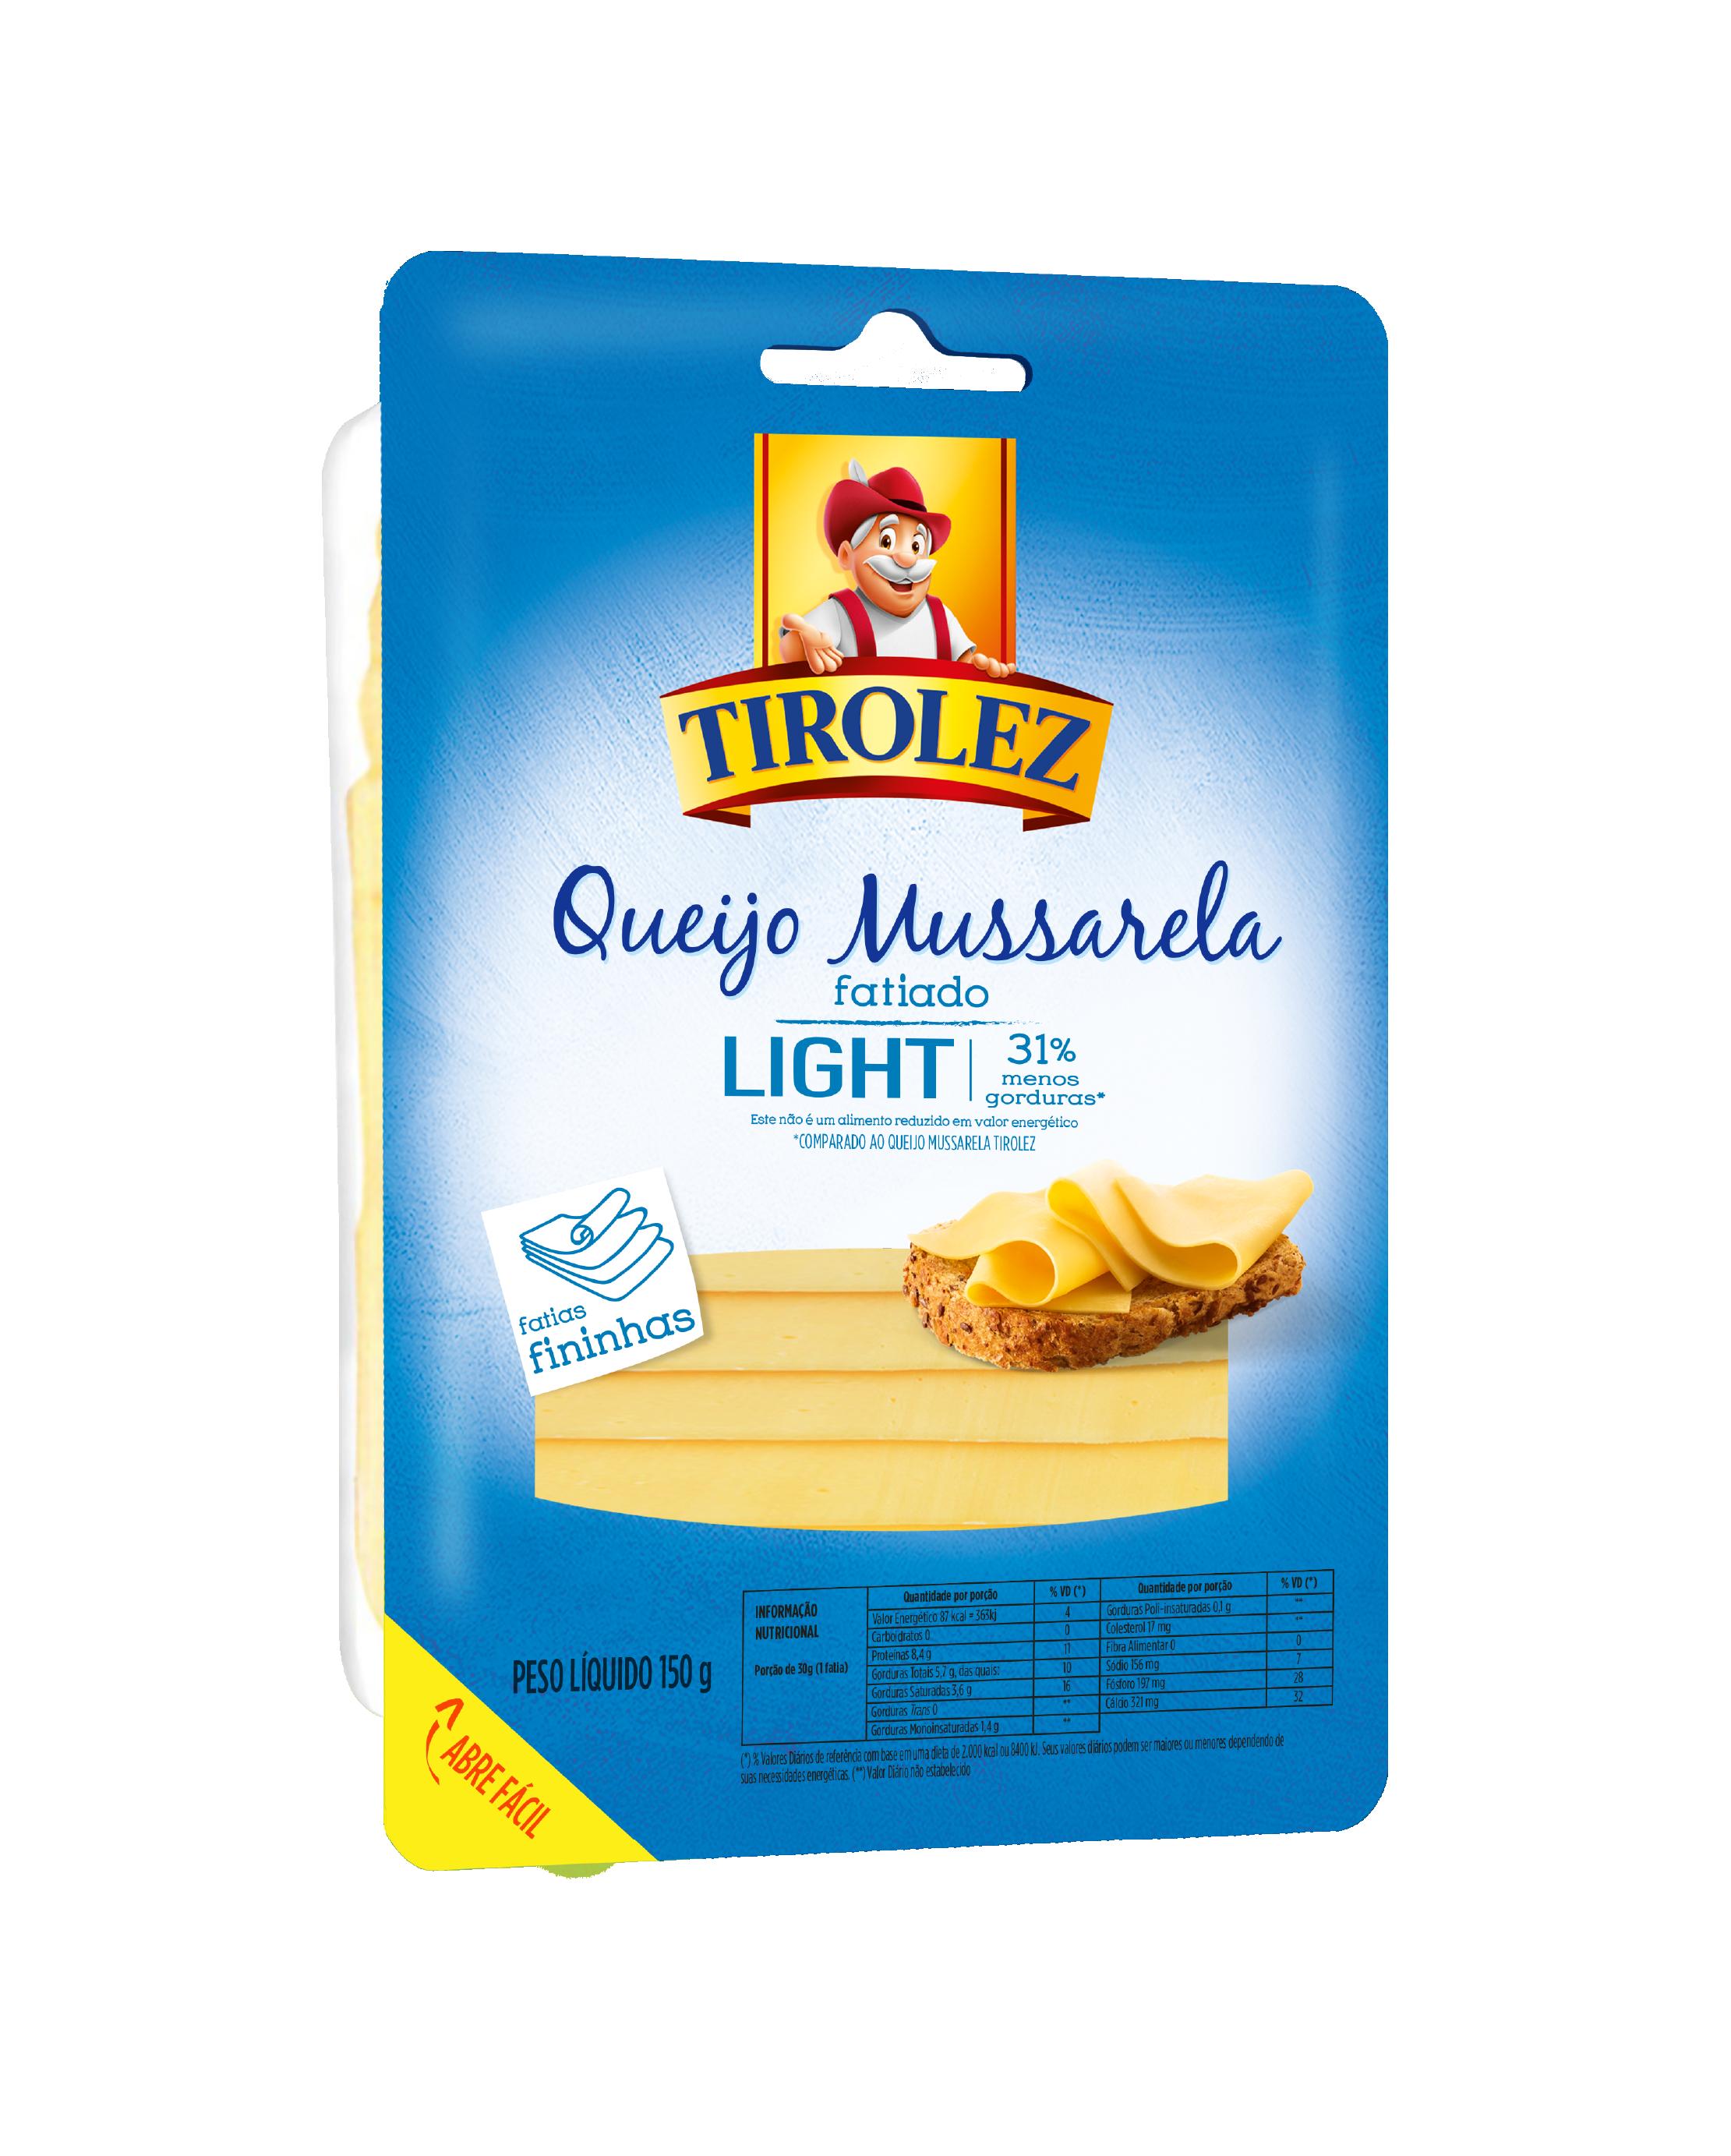 QUEIJO MUSSARELA LIGHT Tirolez 150g